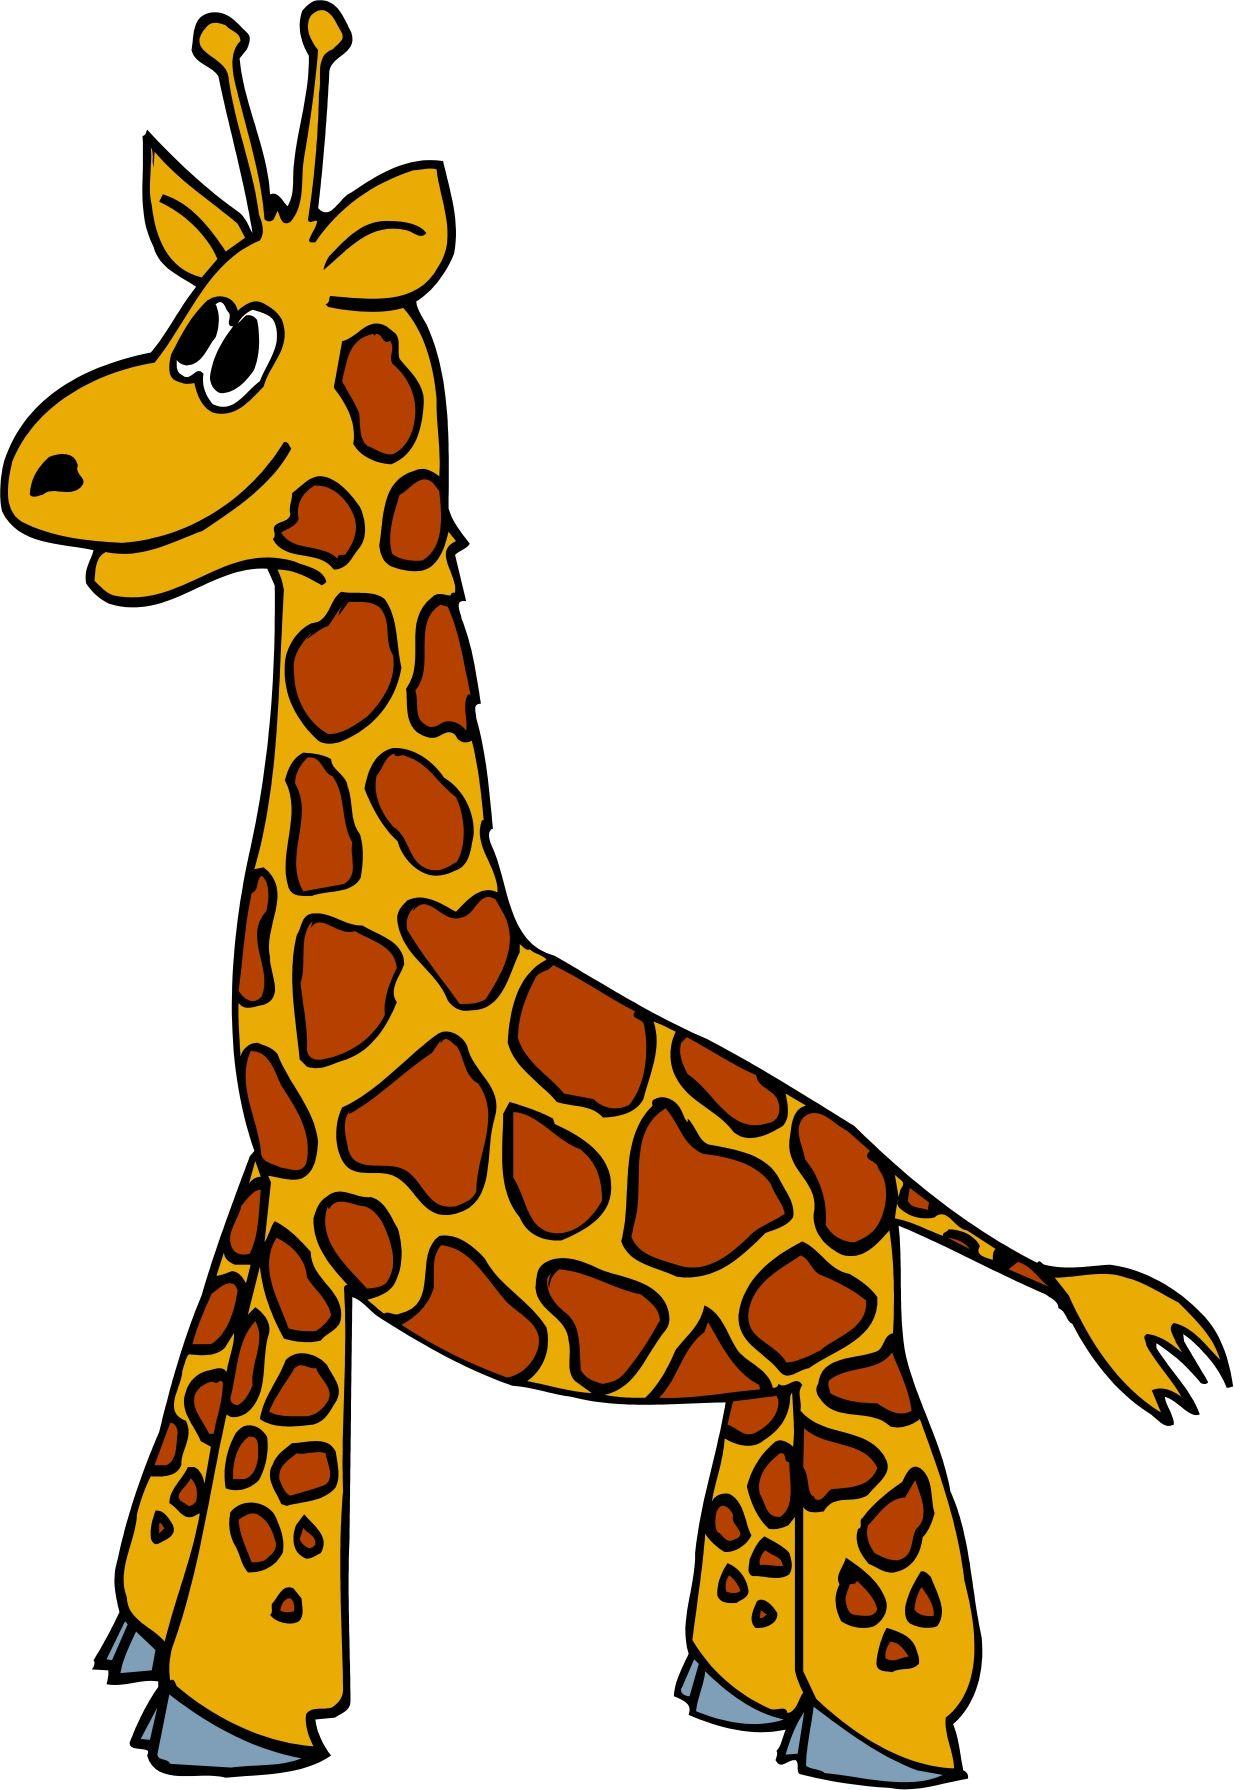 cute baby giraffe clip art clipart clipart image 18664 giraffe rh pinterest ie clipart baby giraffe clipart baby giraffe